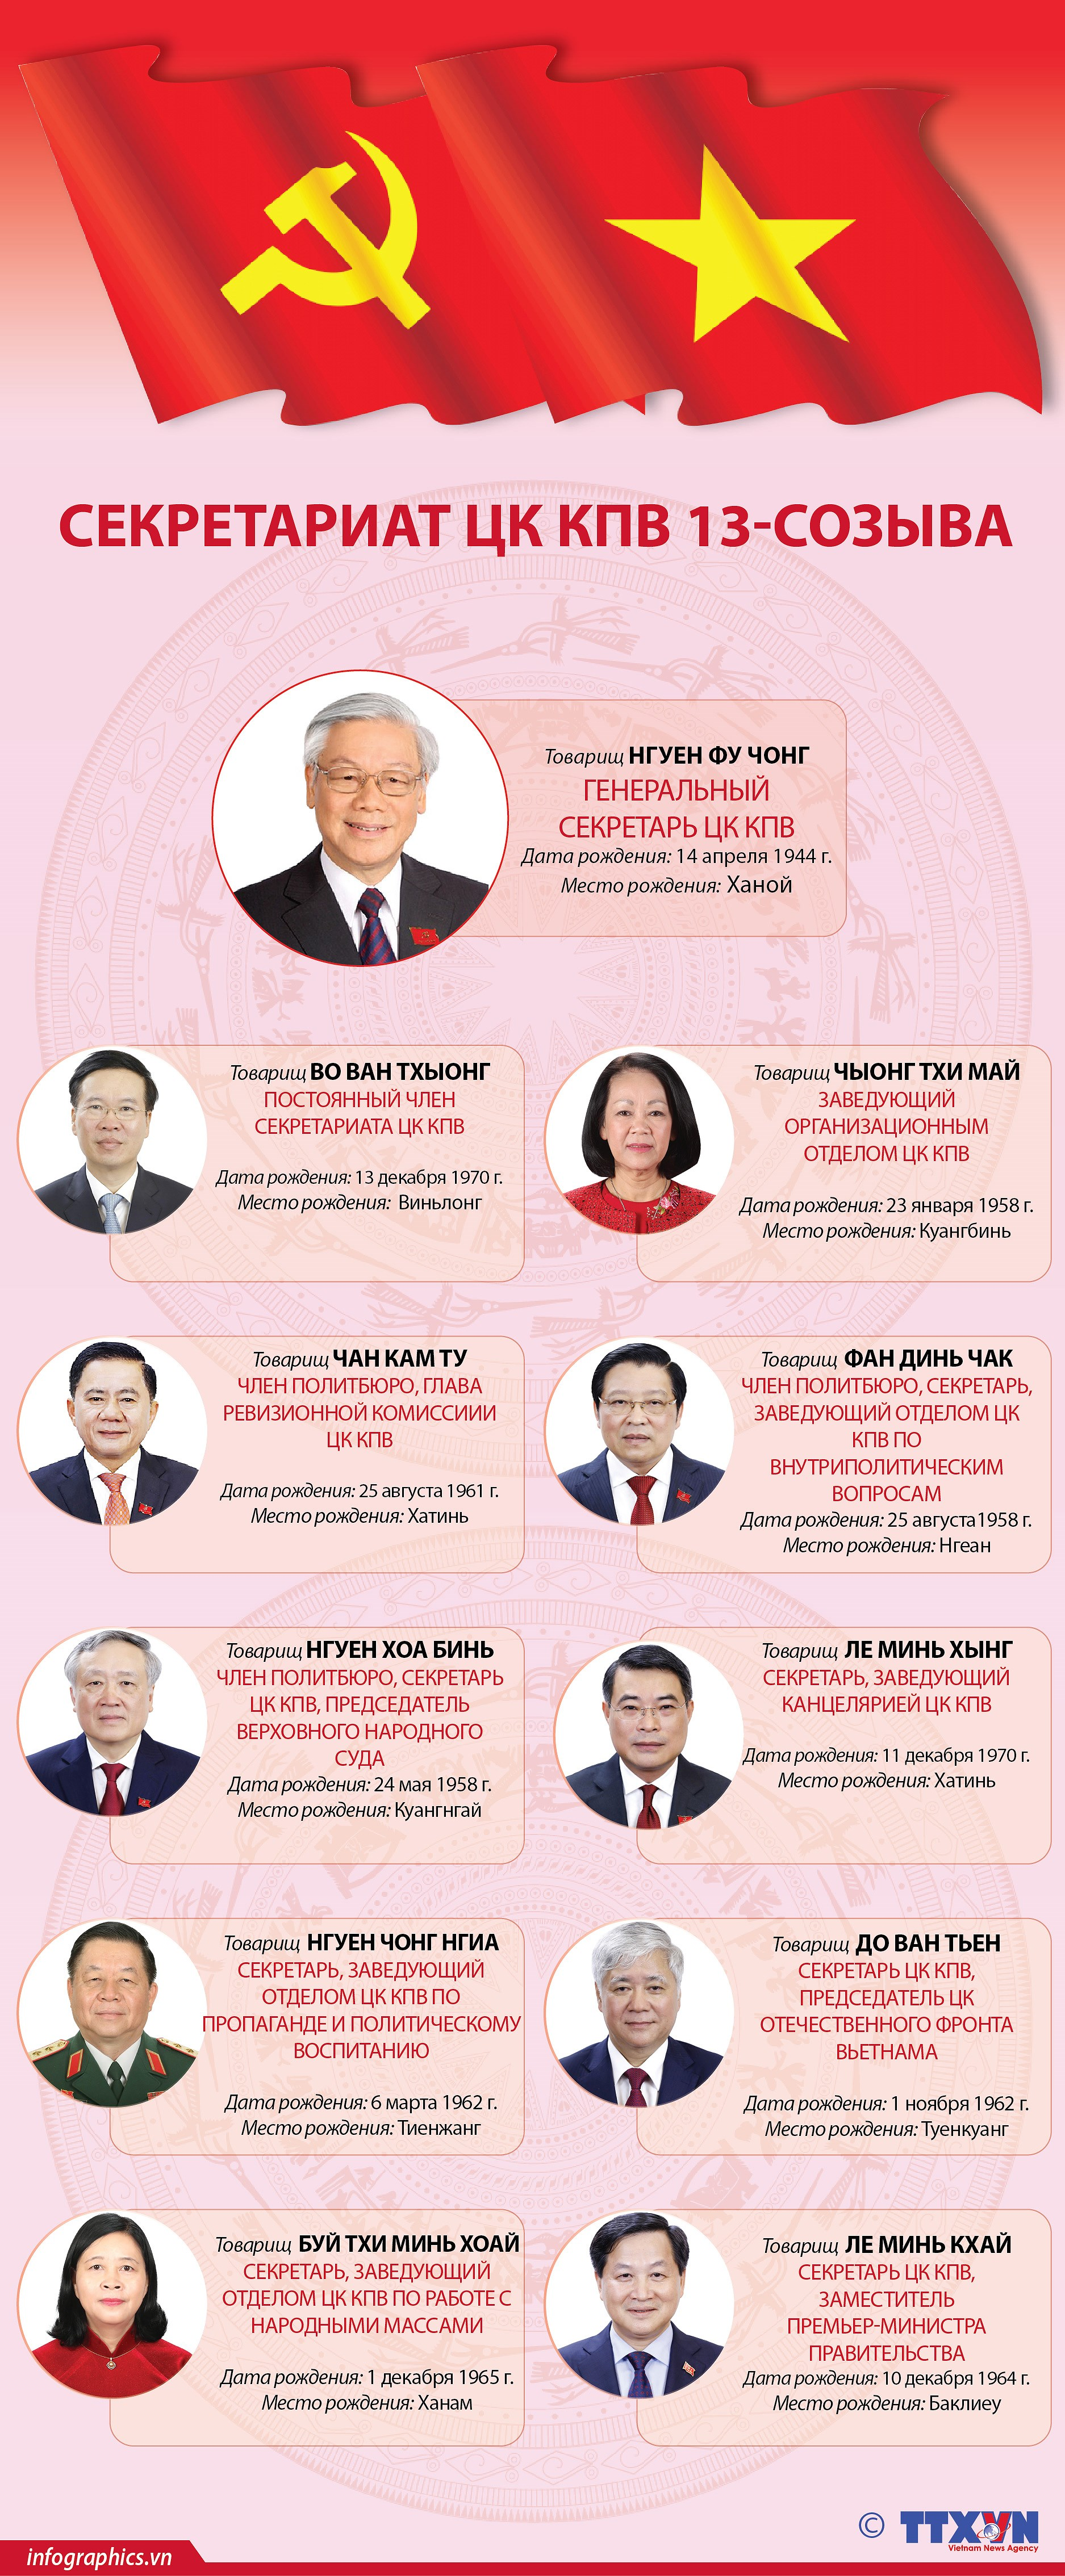 Секретариат ЦК КПВ 13-го созыва hinh anh 1